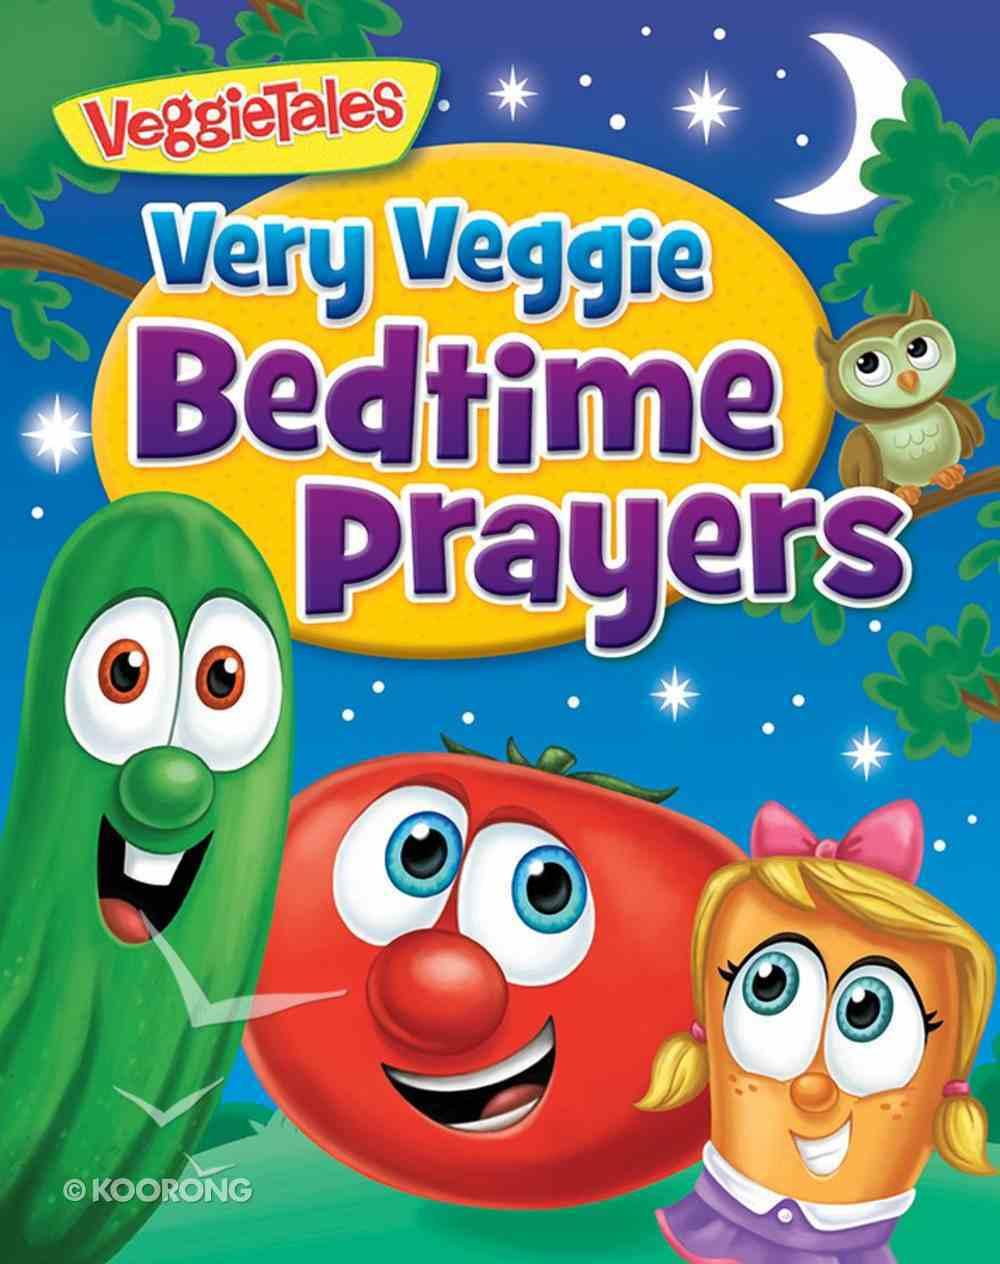 Very Veggie Bedtime Prayers (Veggie Tales (Veggietales) Series) Board Book